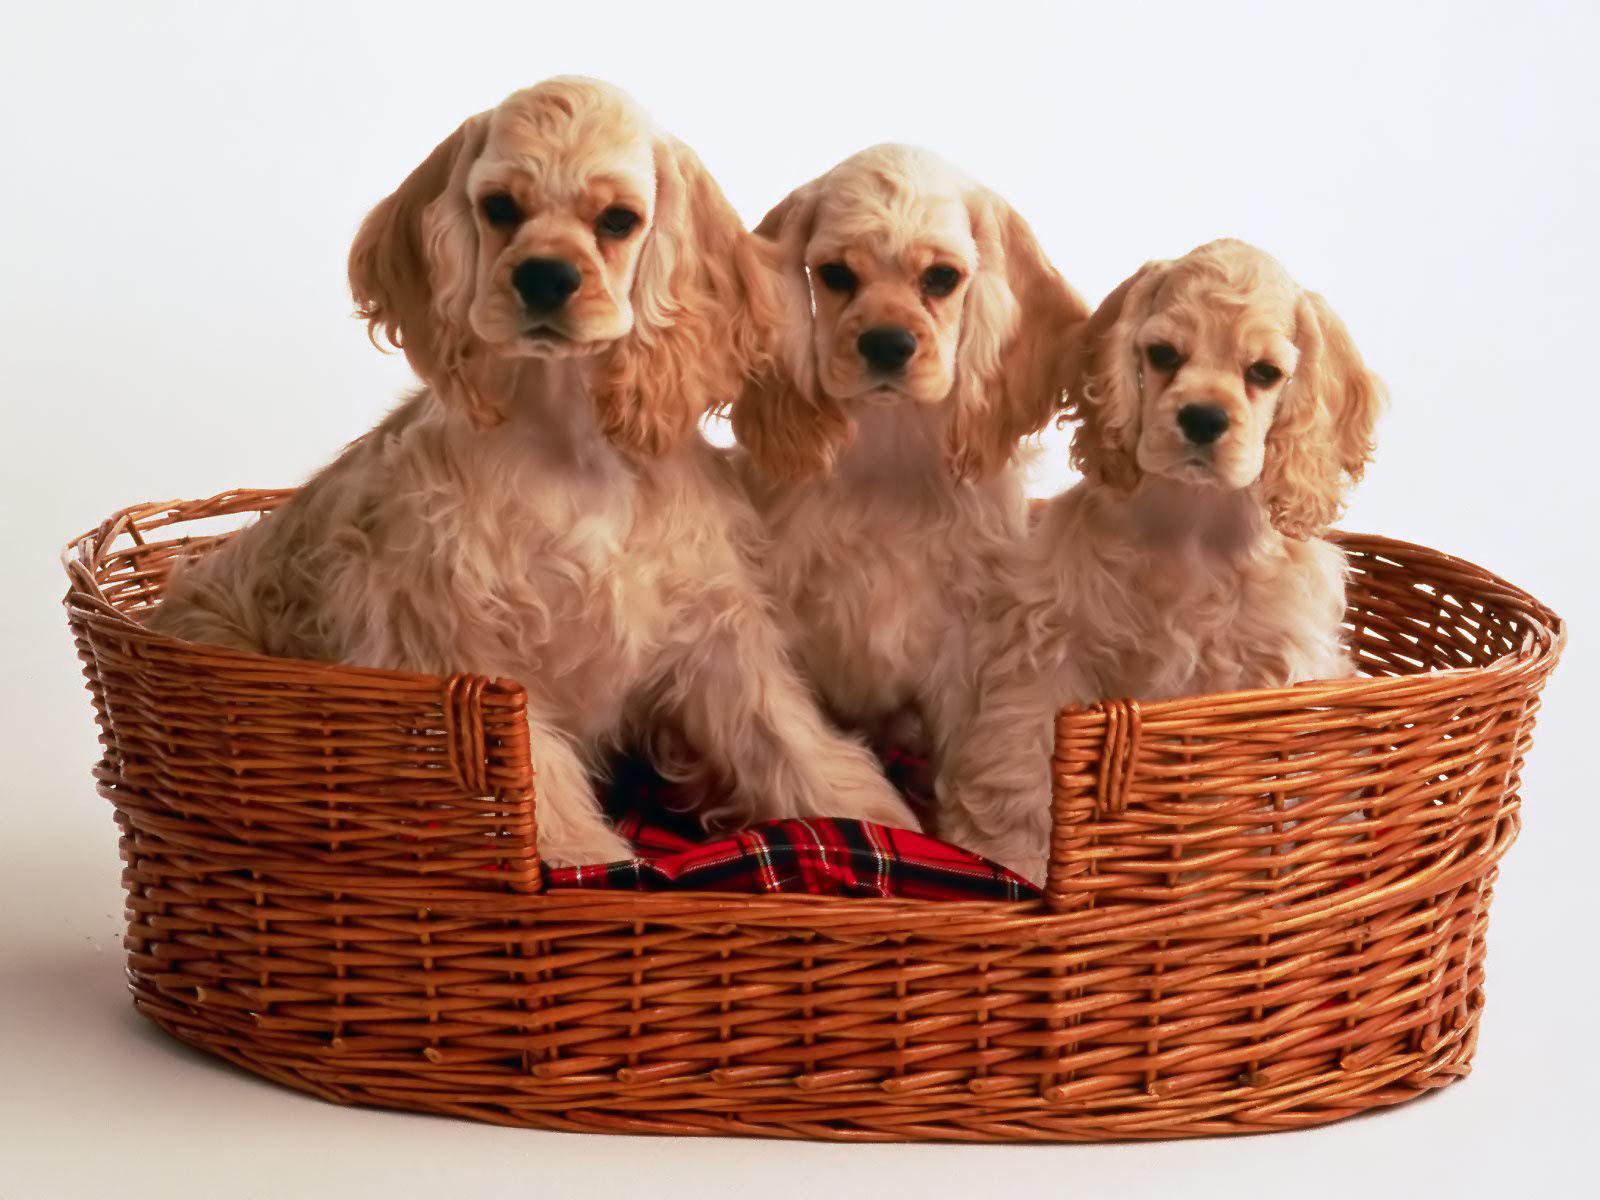 Stunning Cocker Spaniel Puppy For Sale | England UK